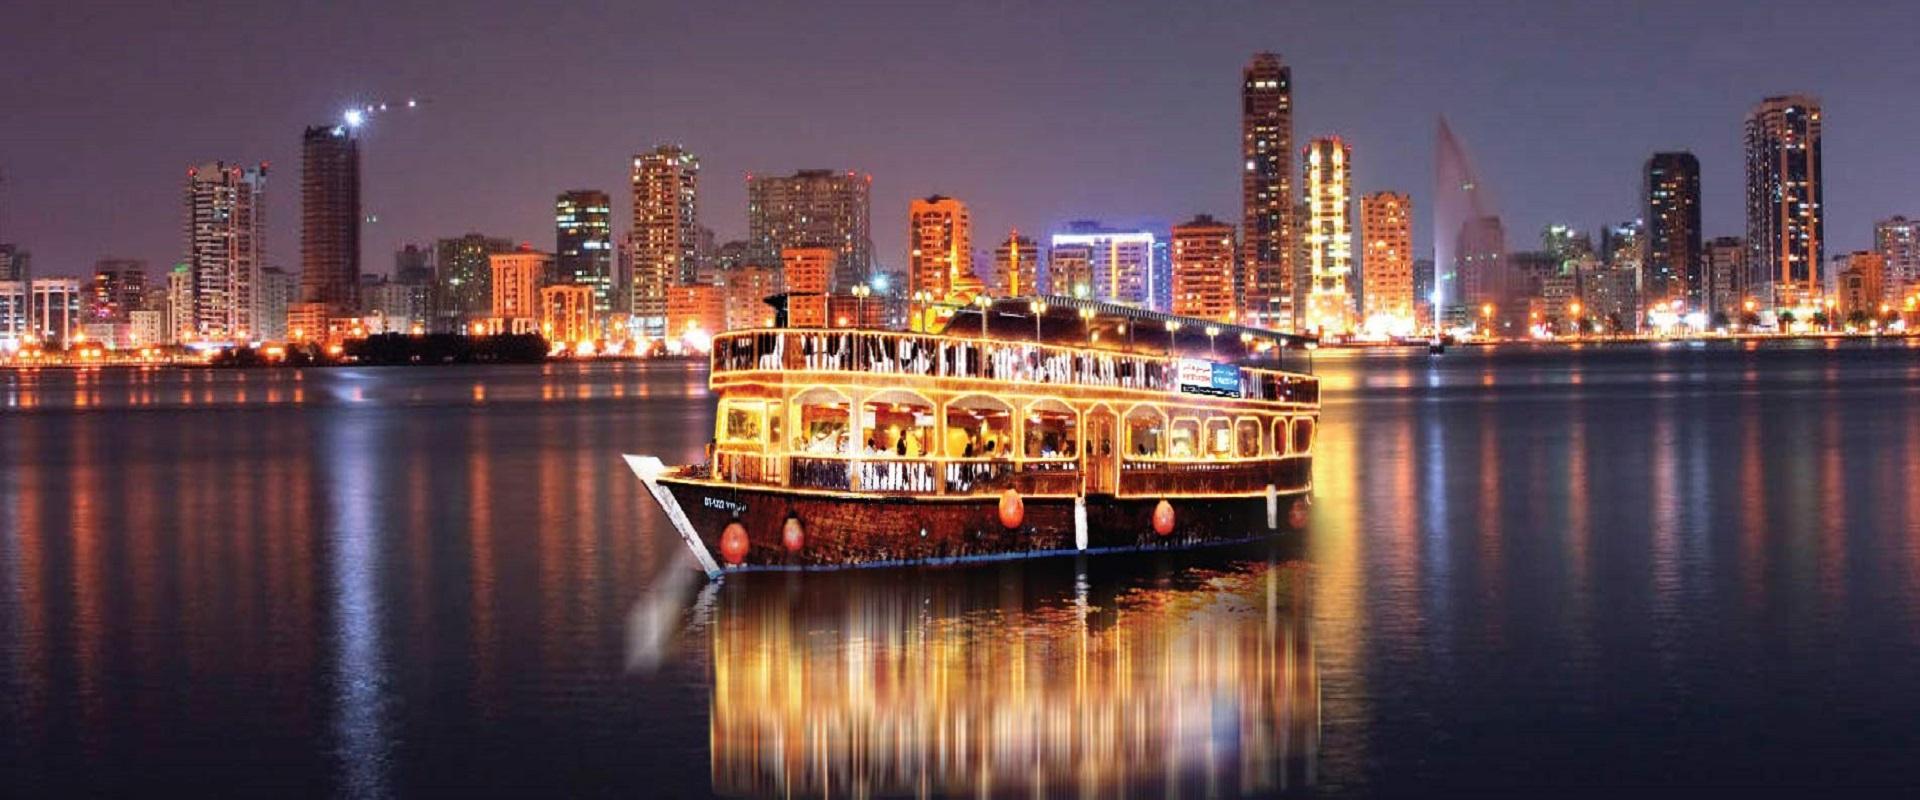 Abu Dhabi Cruise Five Star